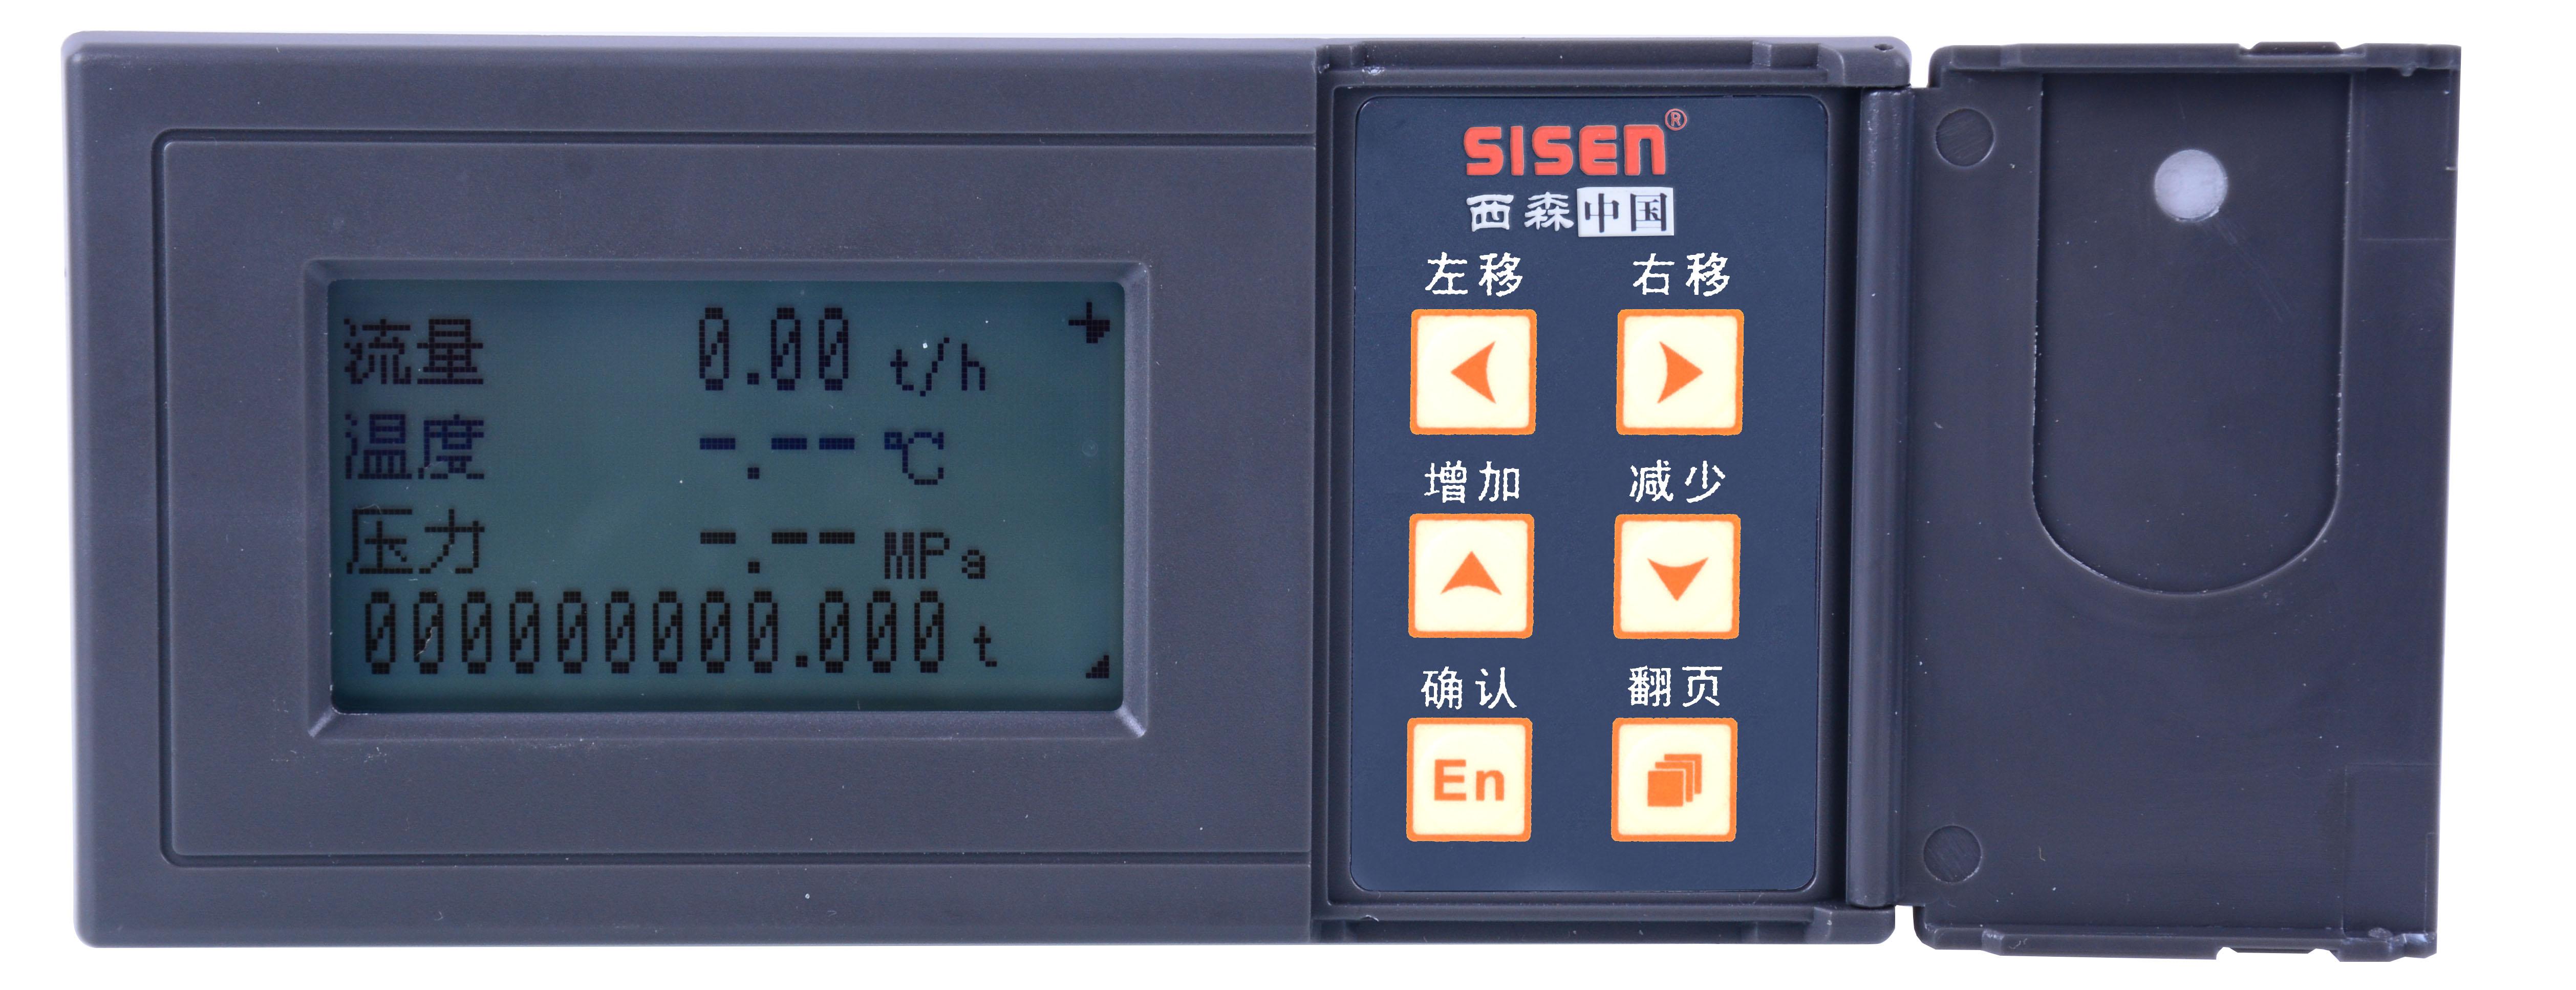 XSFT A4系列热量积算仪